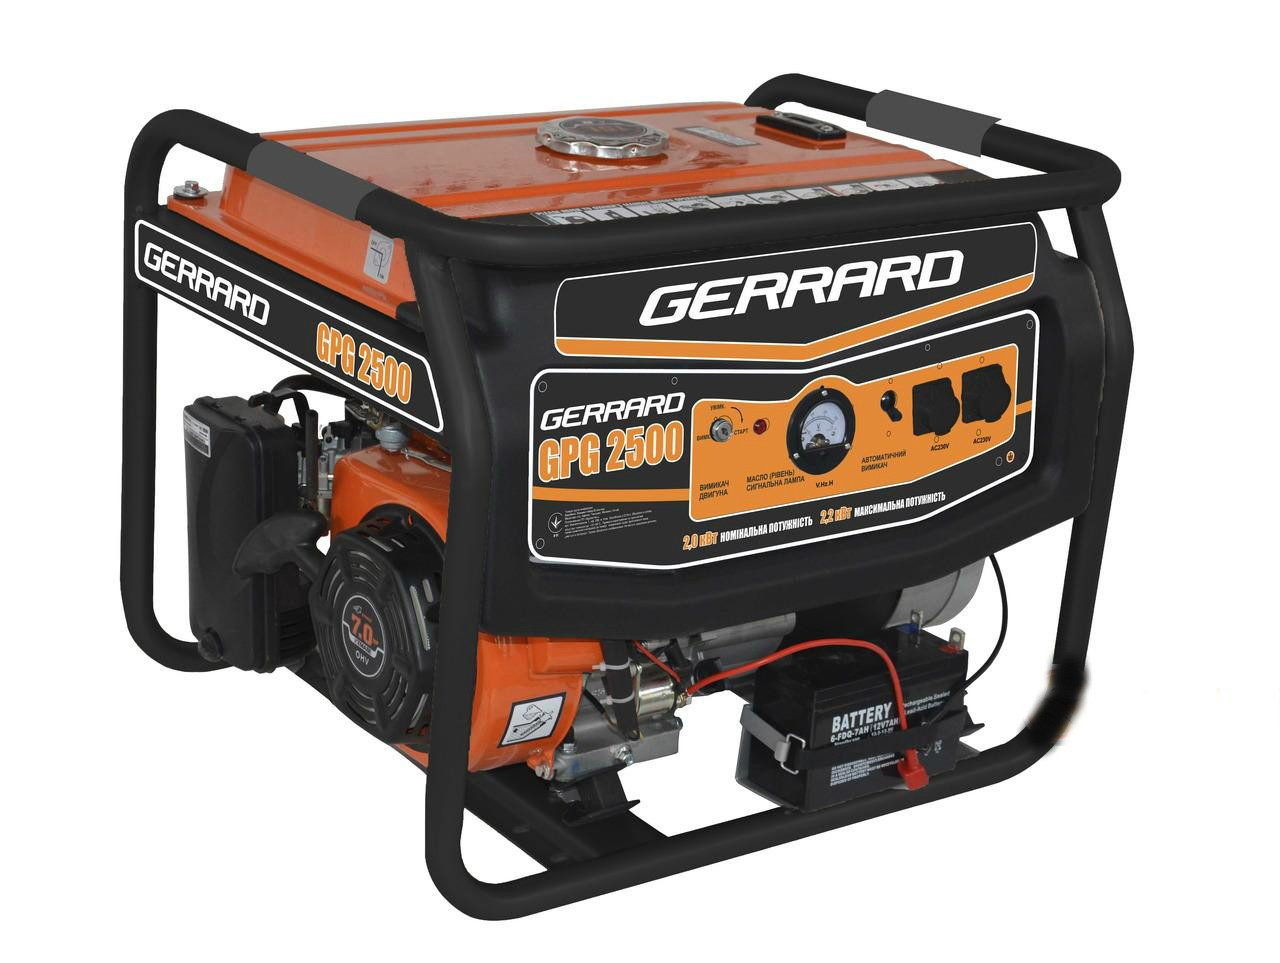 Gerrard GPG2500 Электрогенератор